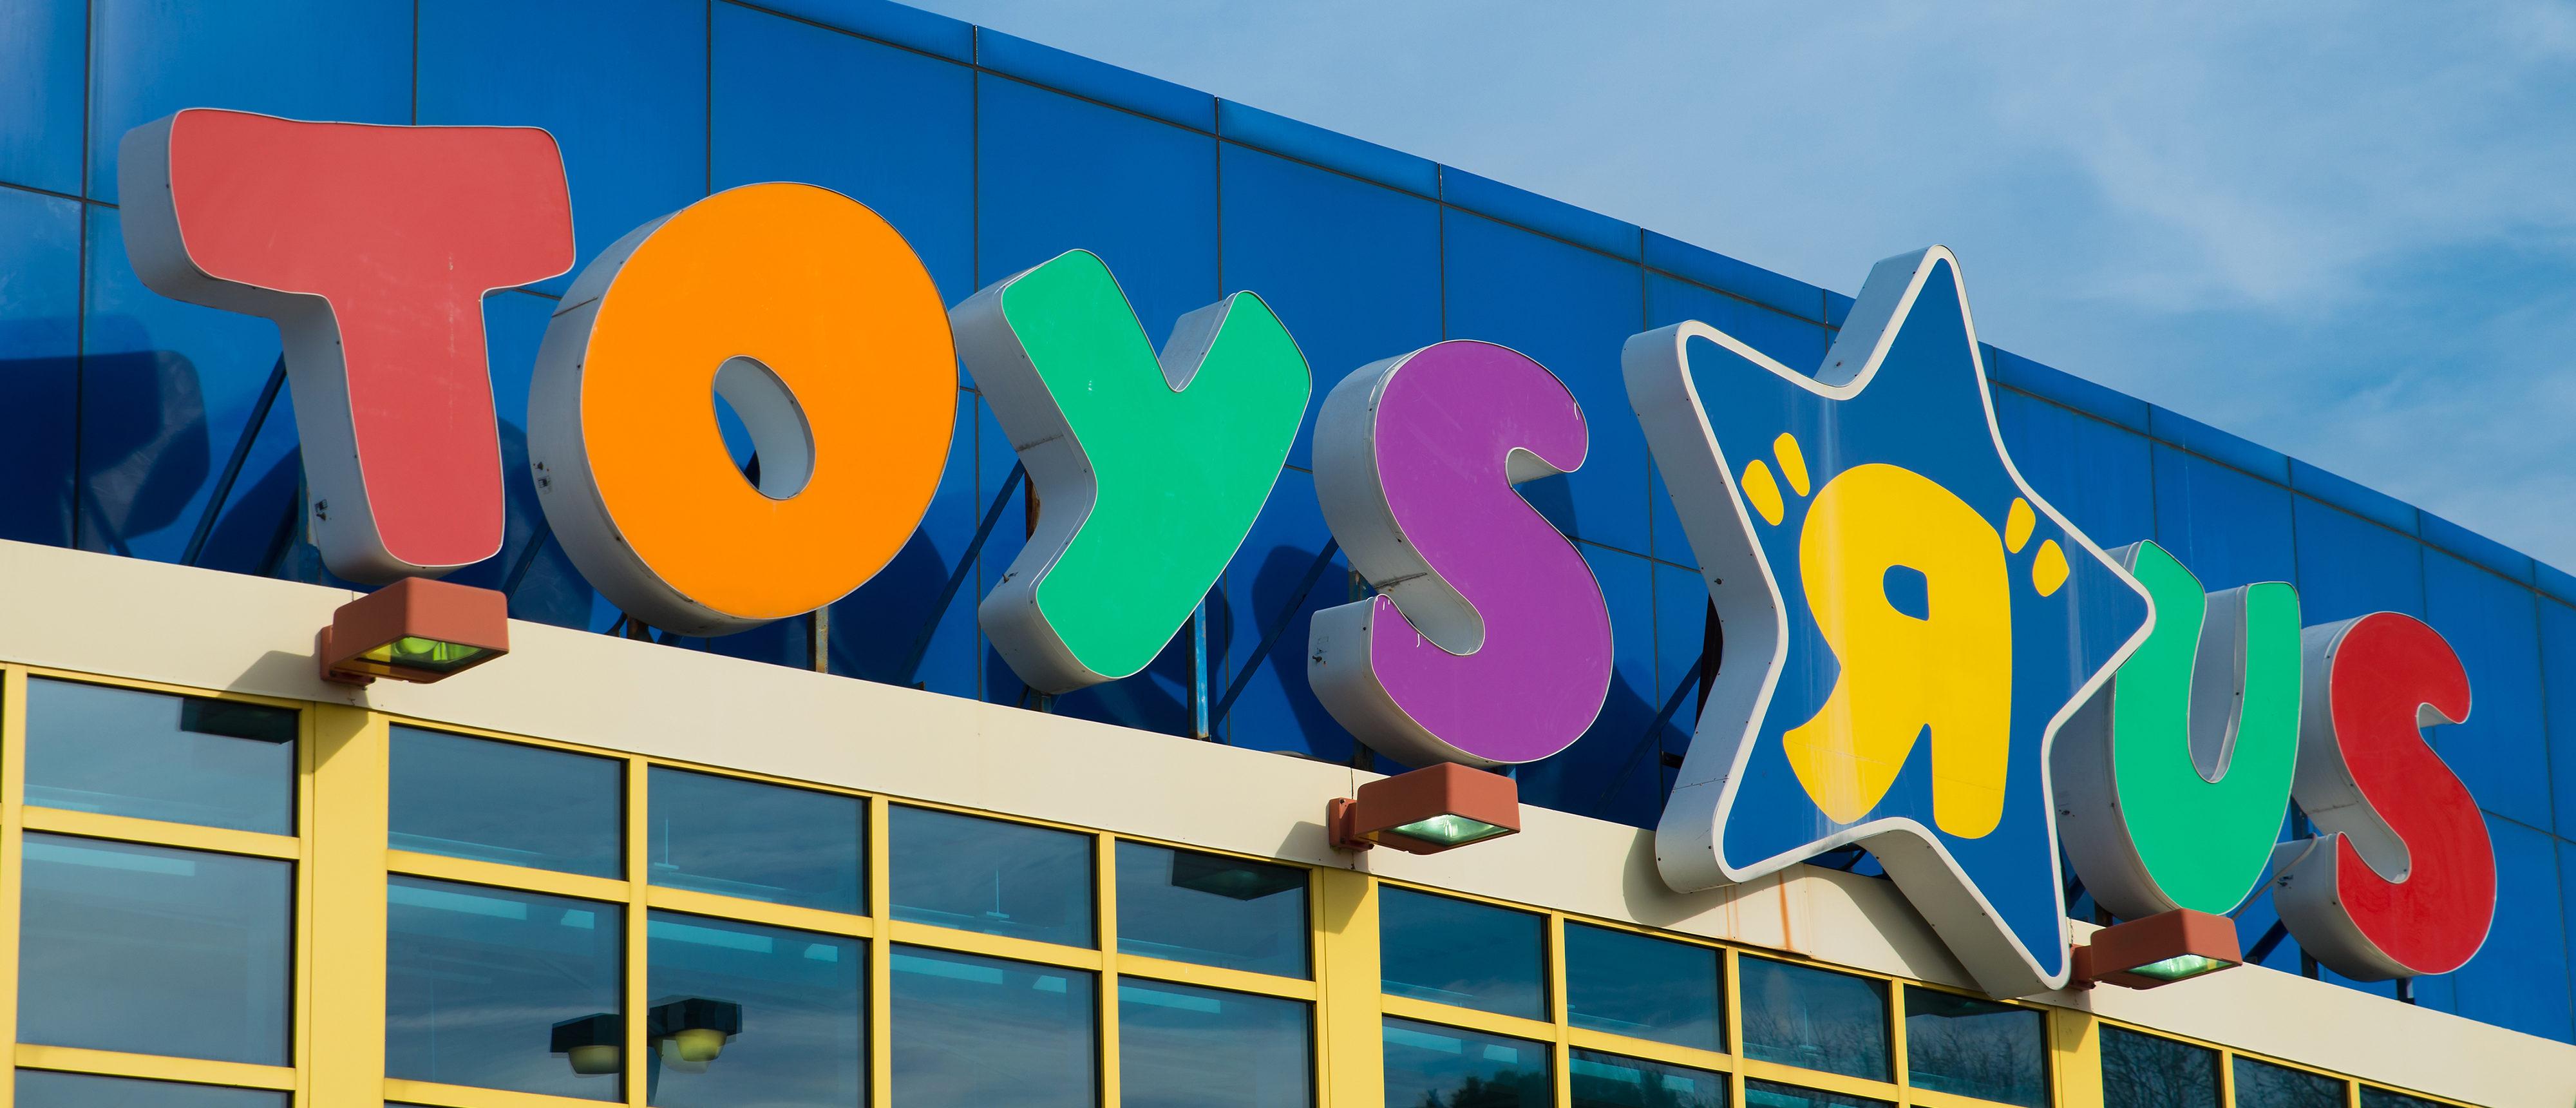 Toys 'R' Us (Shutterstock)